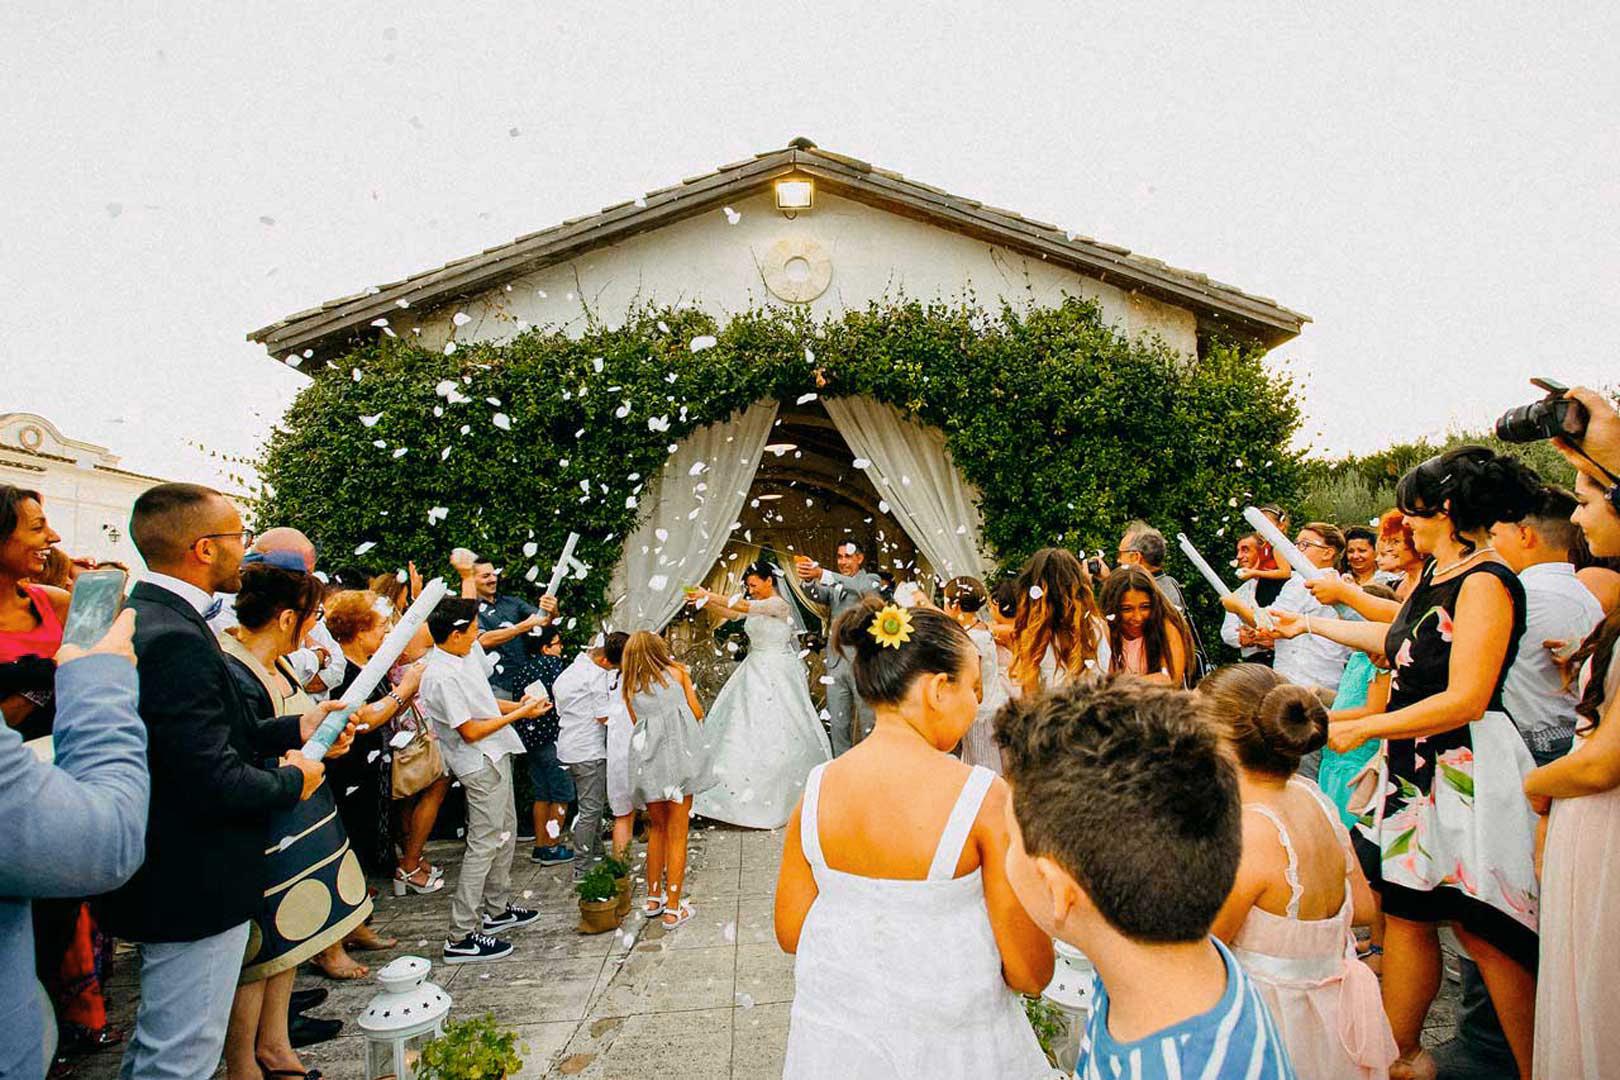 017-lancio-riso-gianni-lepore-wedding-italia